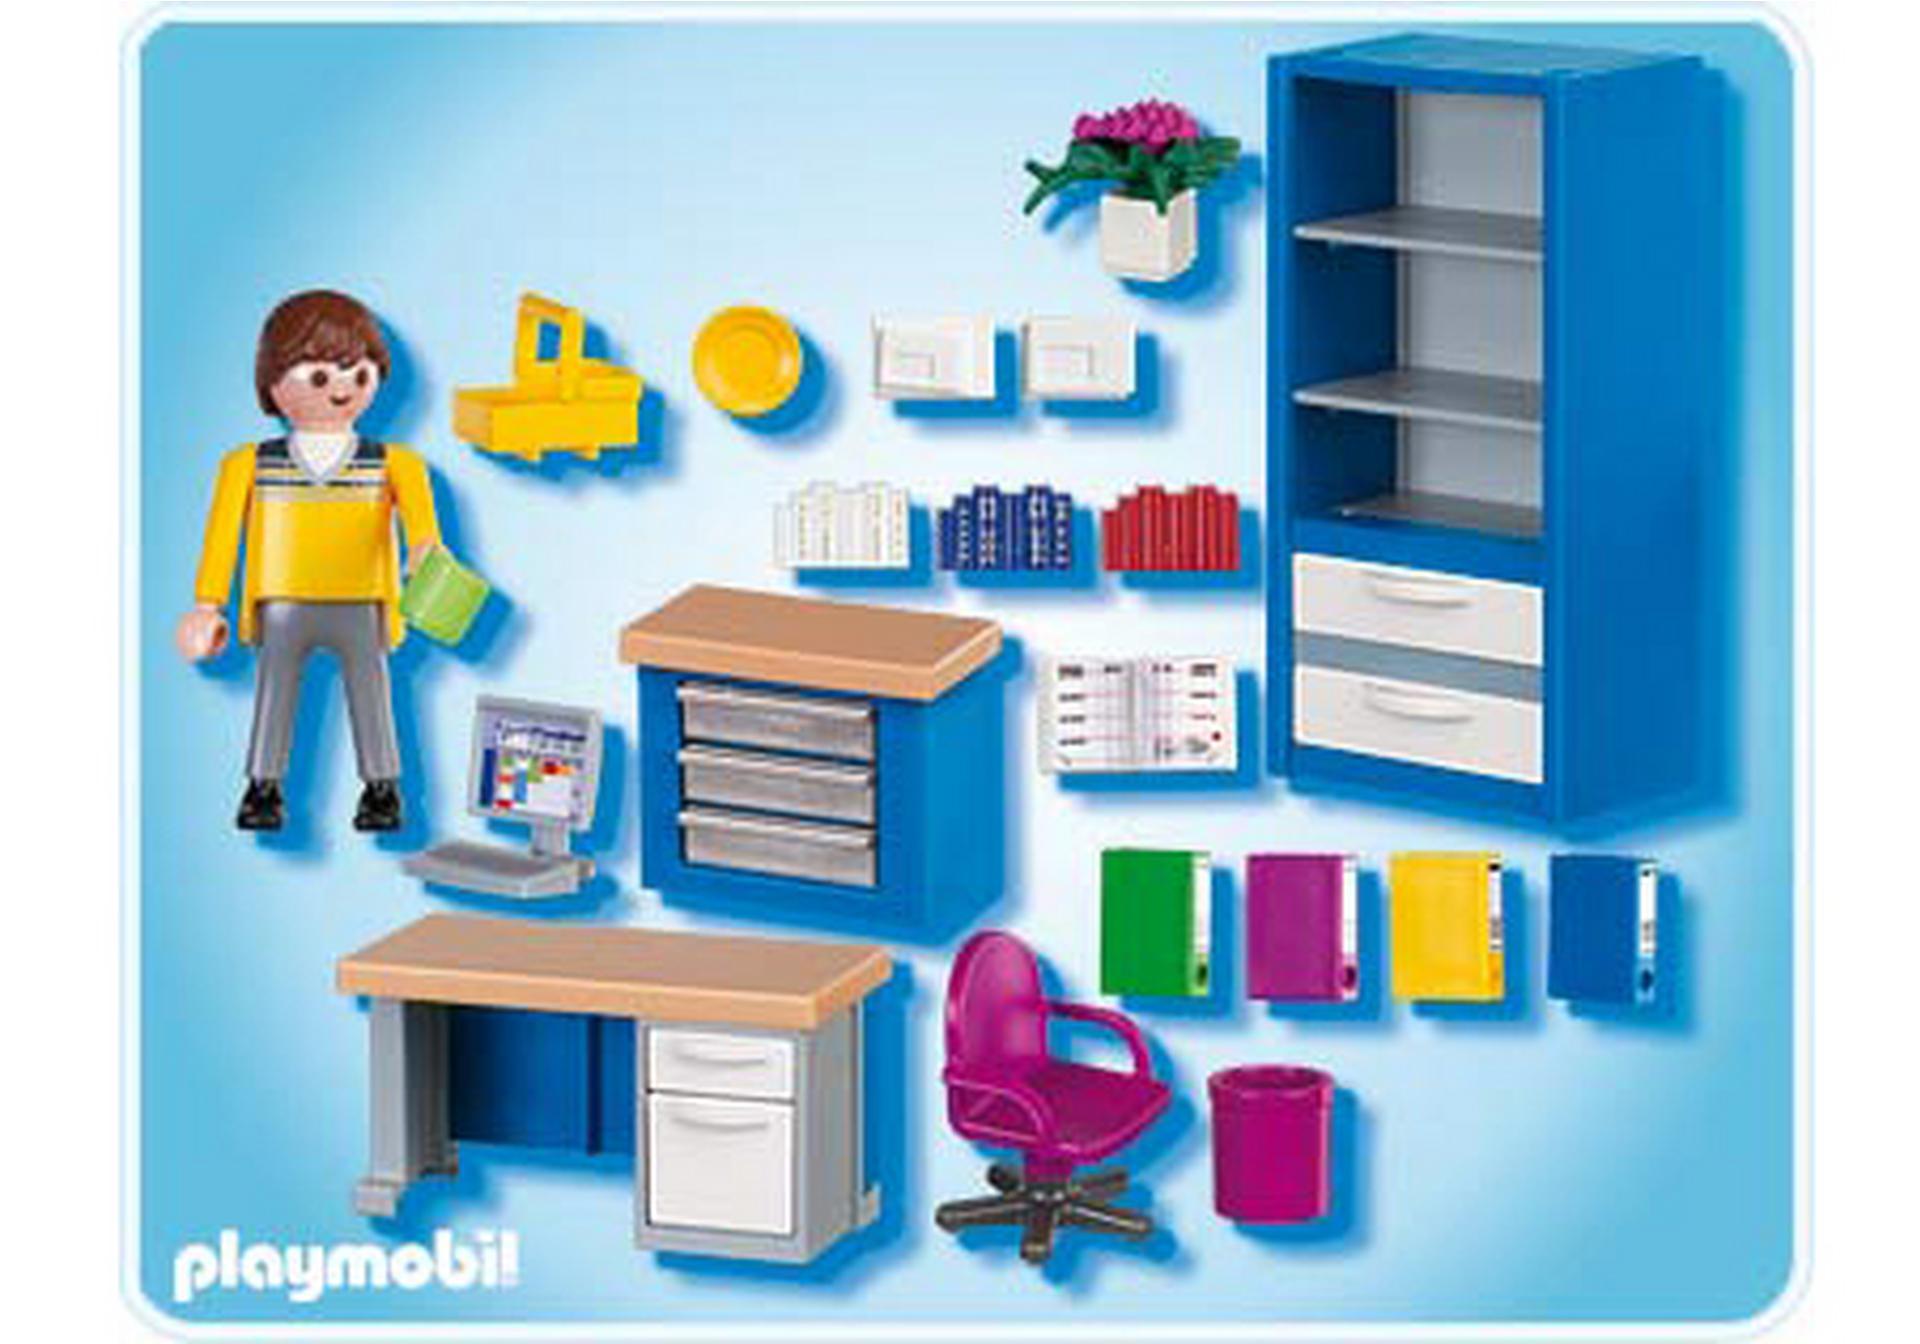 arbeitszimmer 4289 a playmobil deutschland. Black Bedroom Furniture Sets. Home Design Ideas